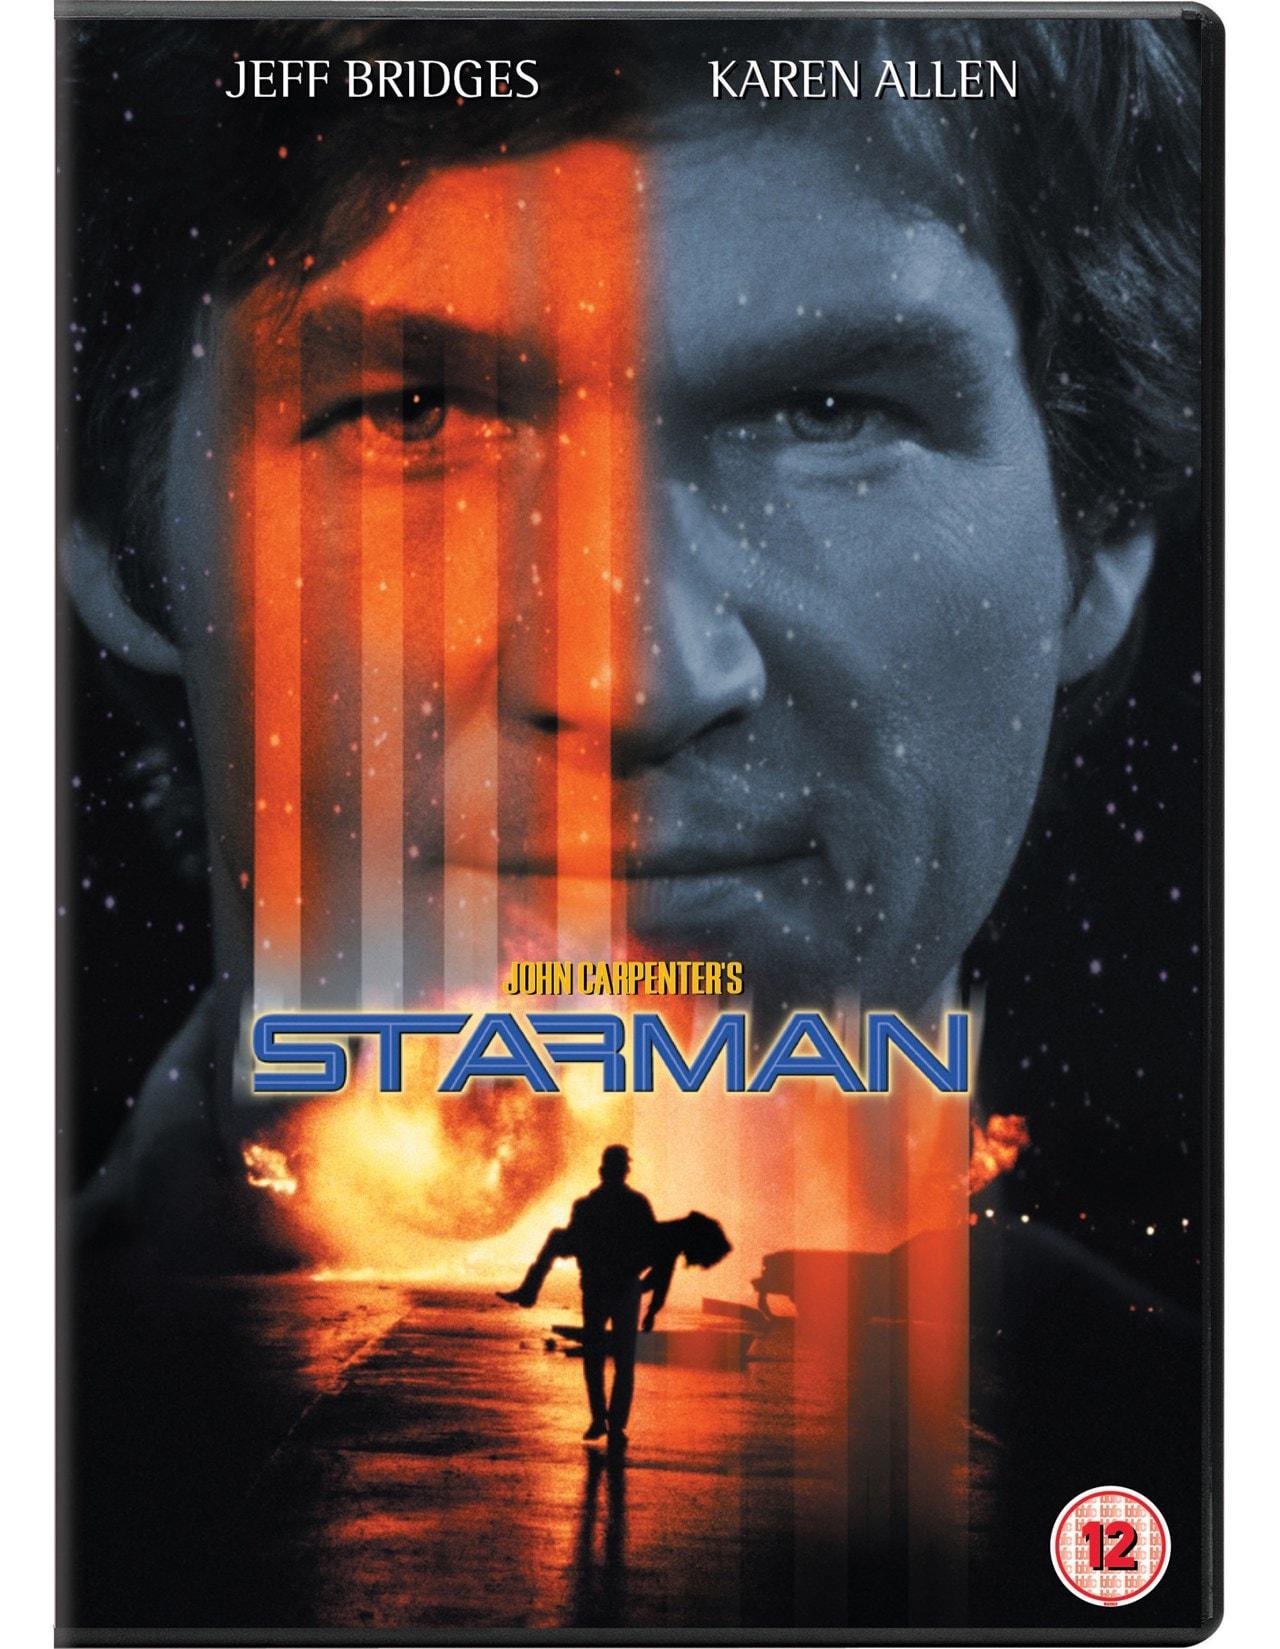 Starman - 1